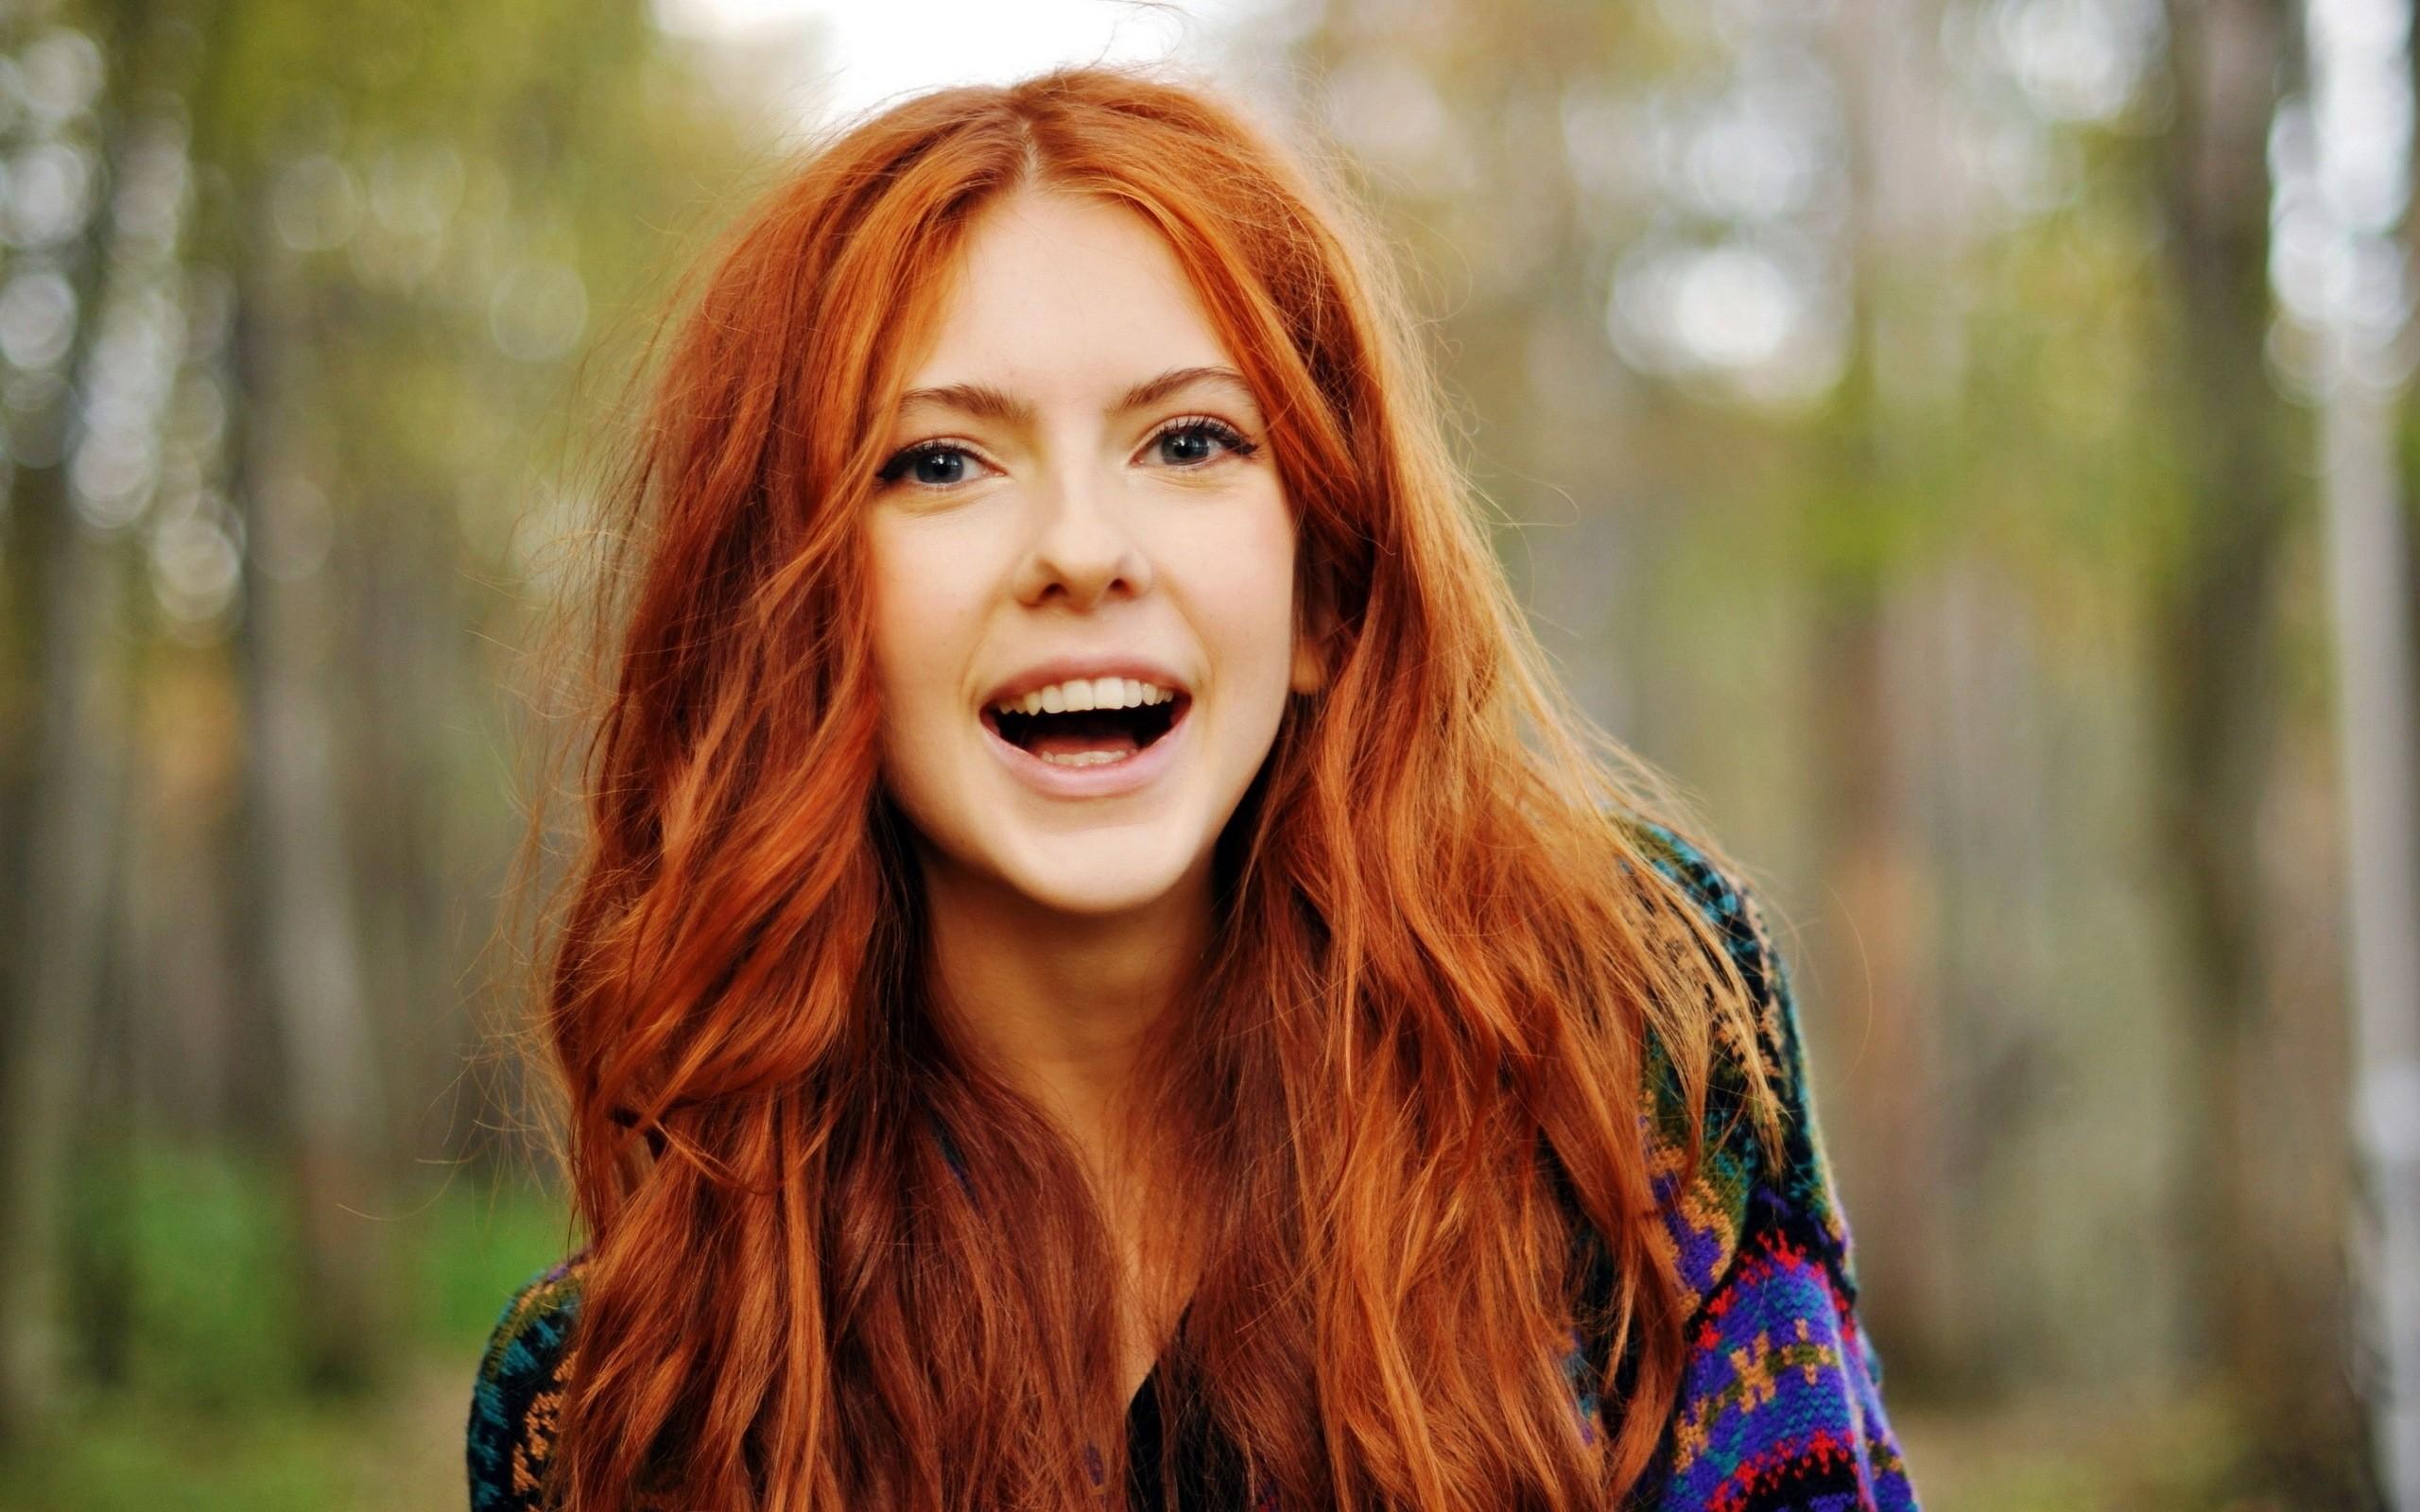 redhead girl laugh nice